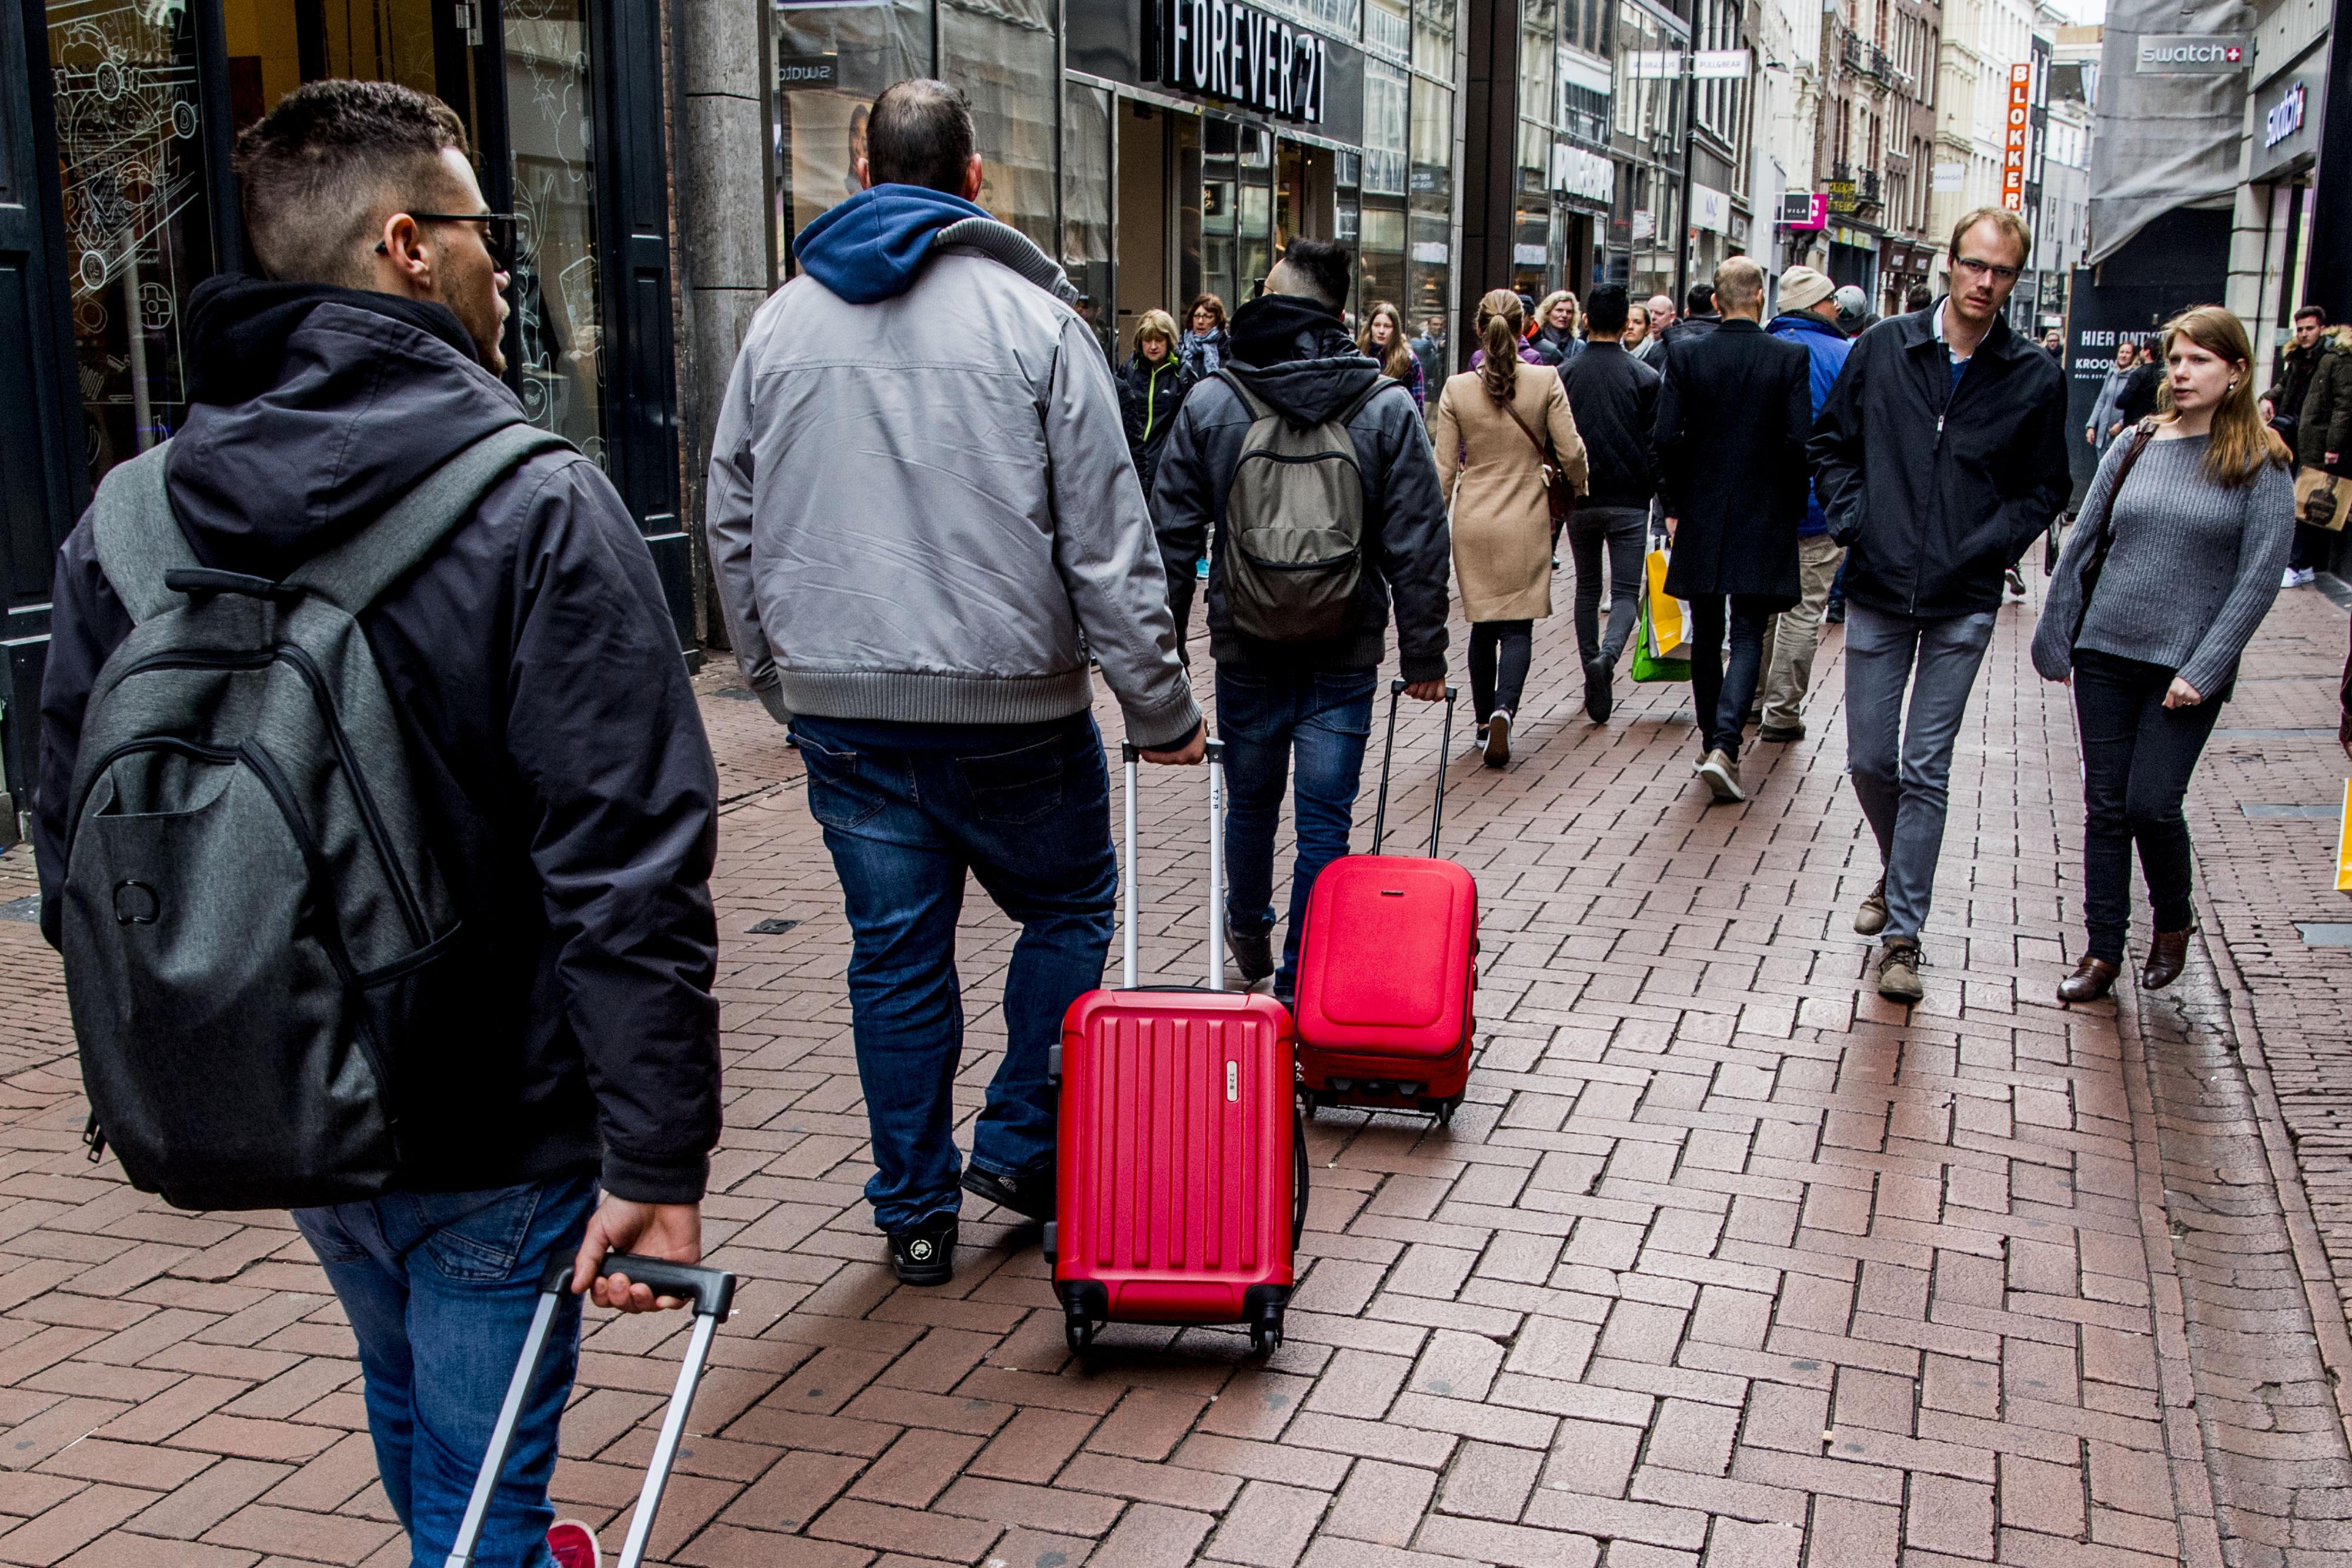 Nederland weer erg populair onder toeristen